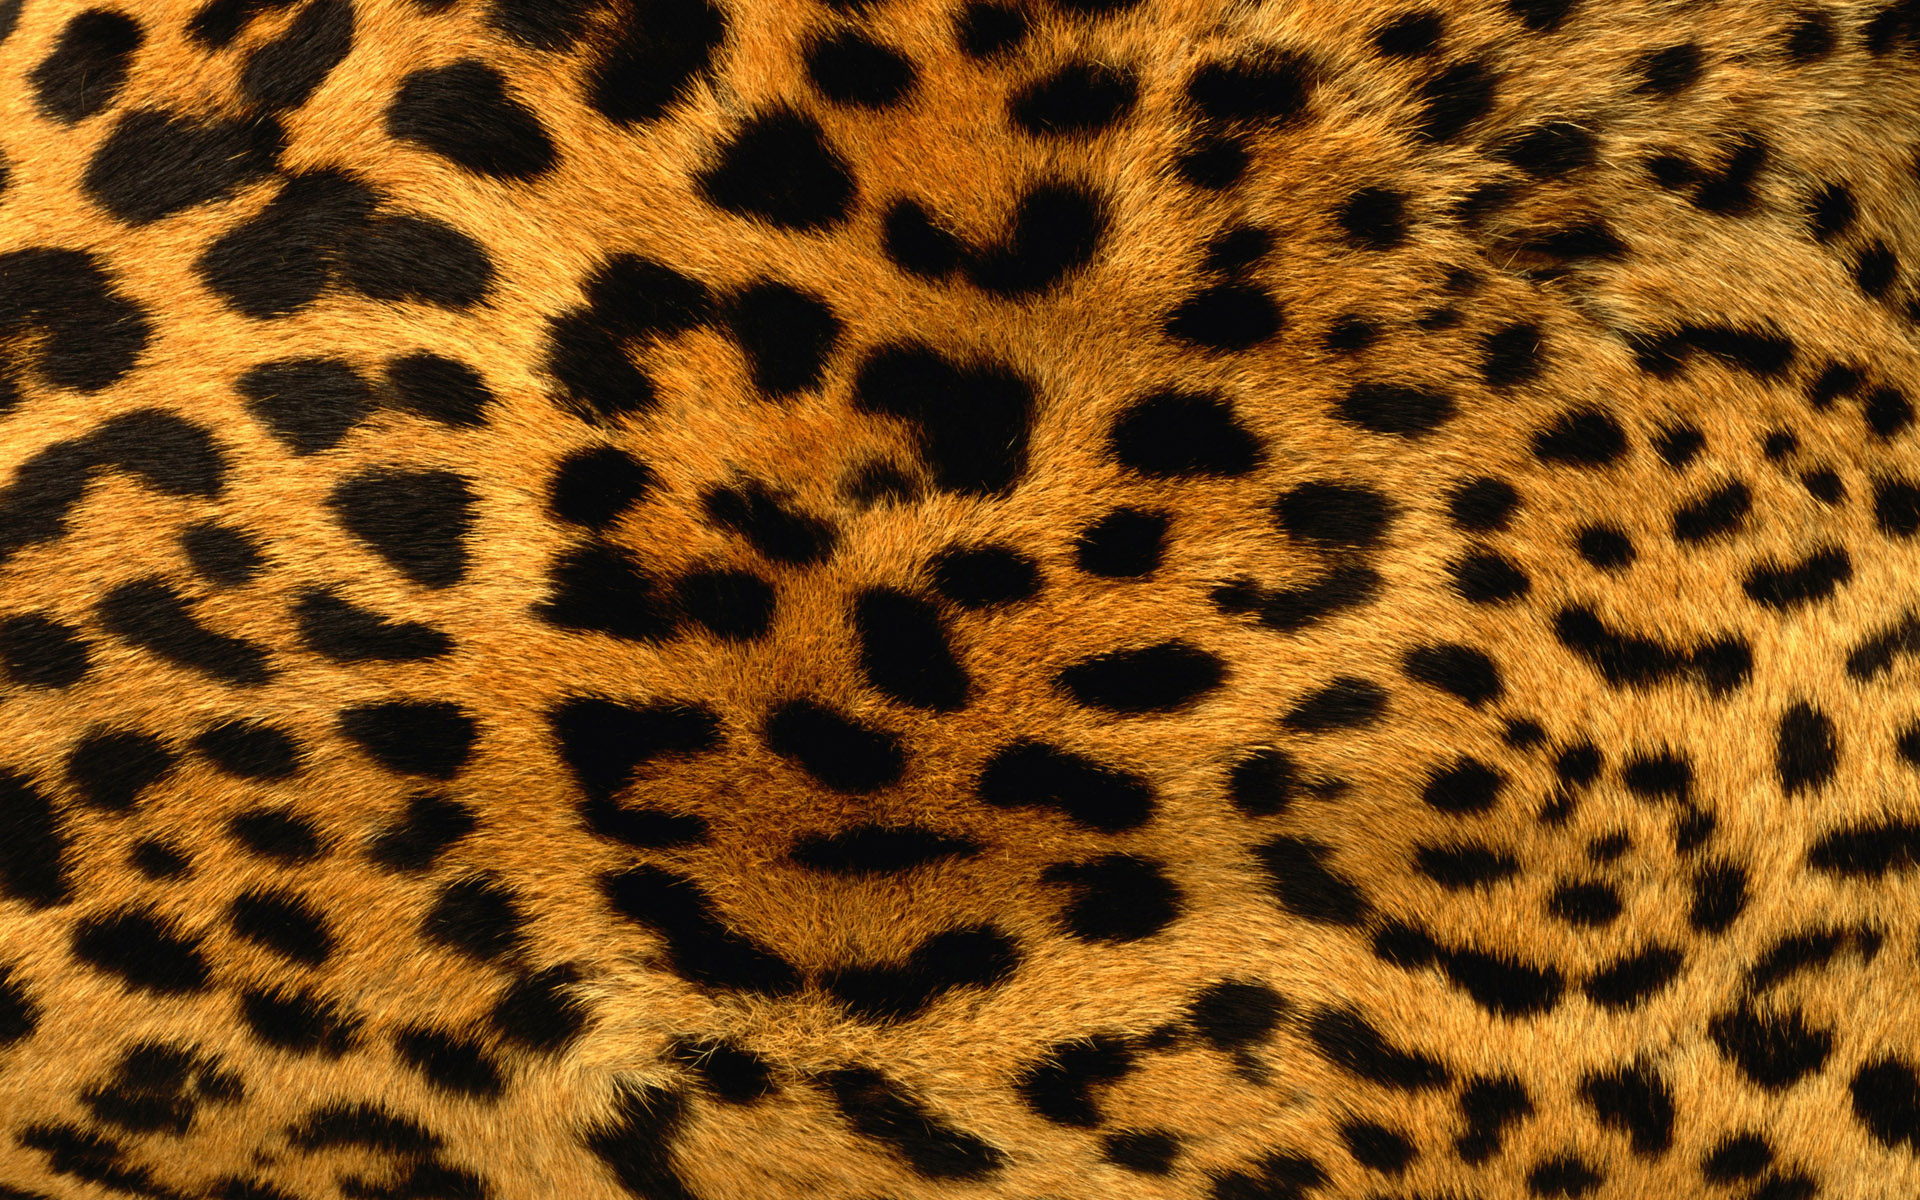 Cheetah Print Wallpaper loopelecom 1920x1200